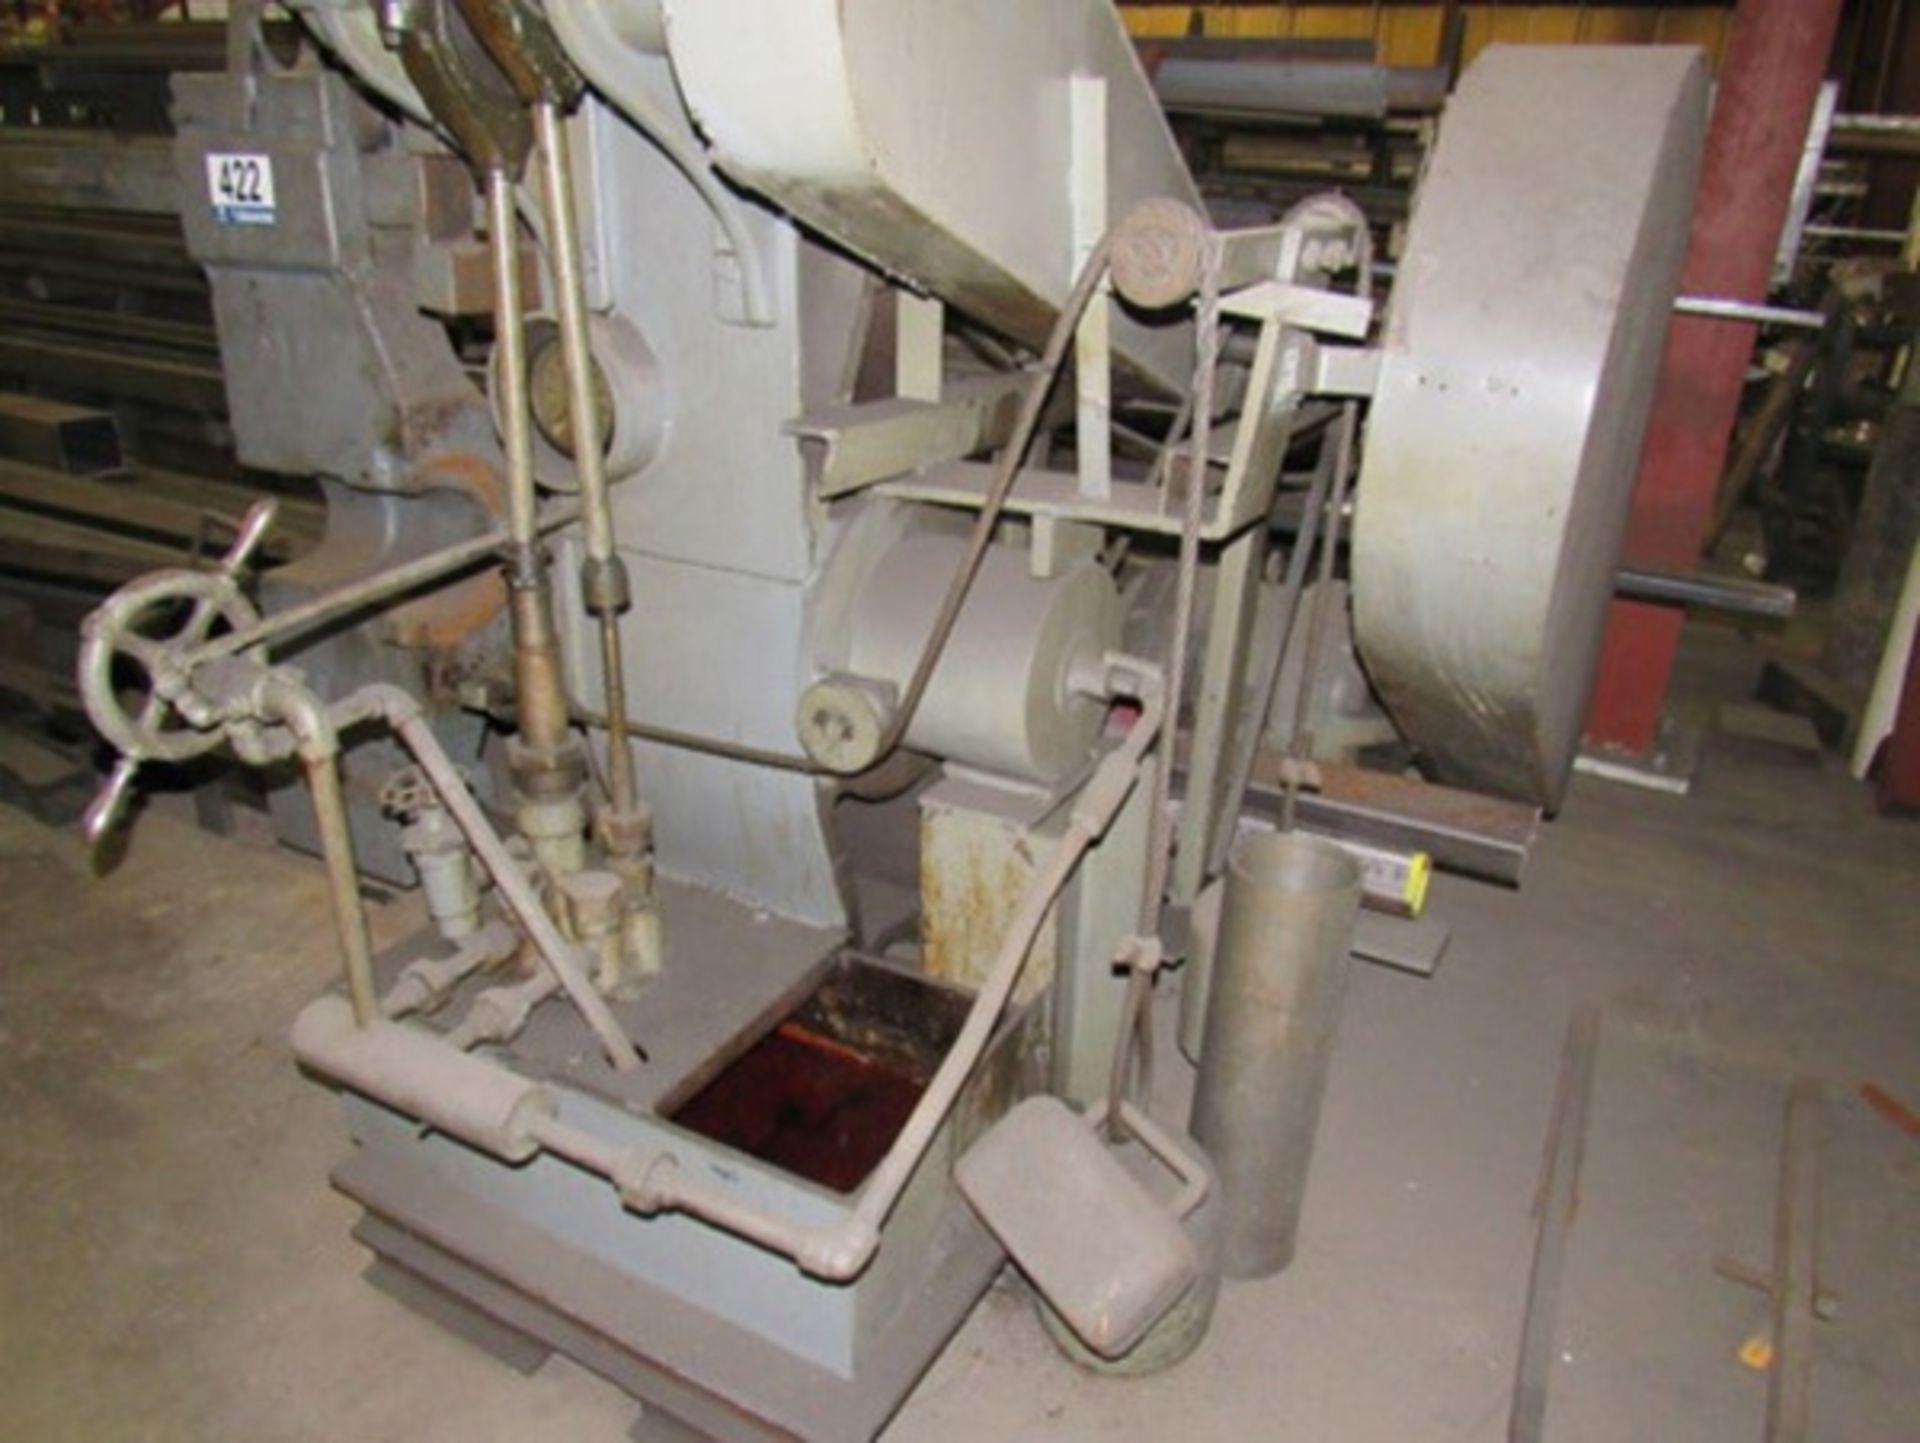 "Rogers Hydraulic Wheel Press | 100-Ton x 120"", Mdl: 2877, S/N: N/A - 8097P - Image 4 of 7"